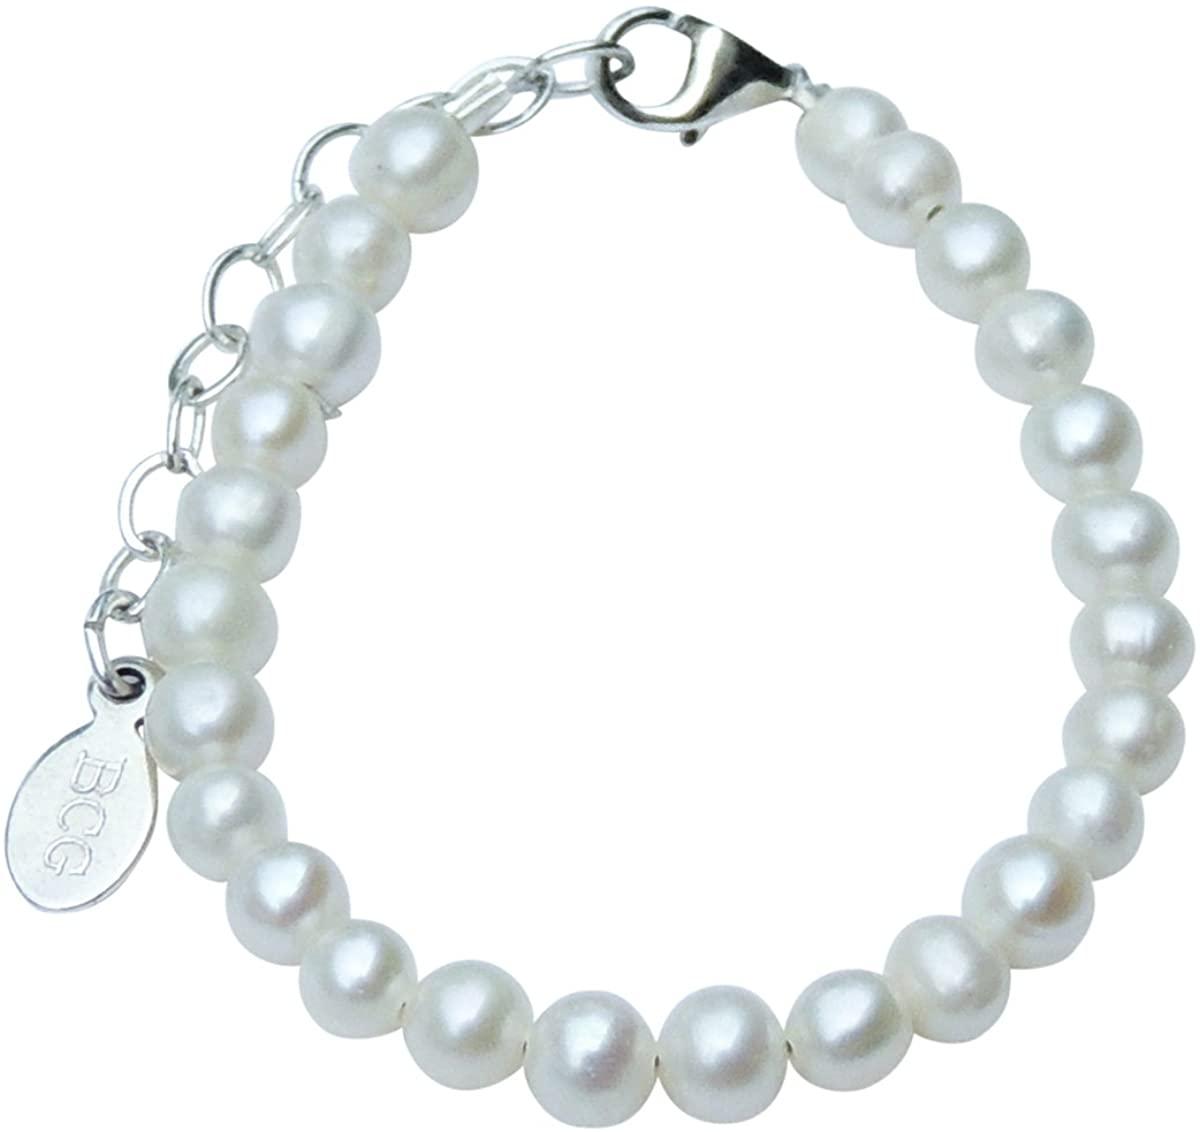 Beloved Child Goods Tiny Cultured Freshwater Pearl & Sterling Silver Bracelet for Babies